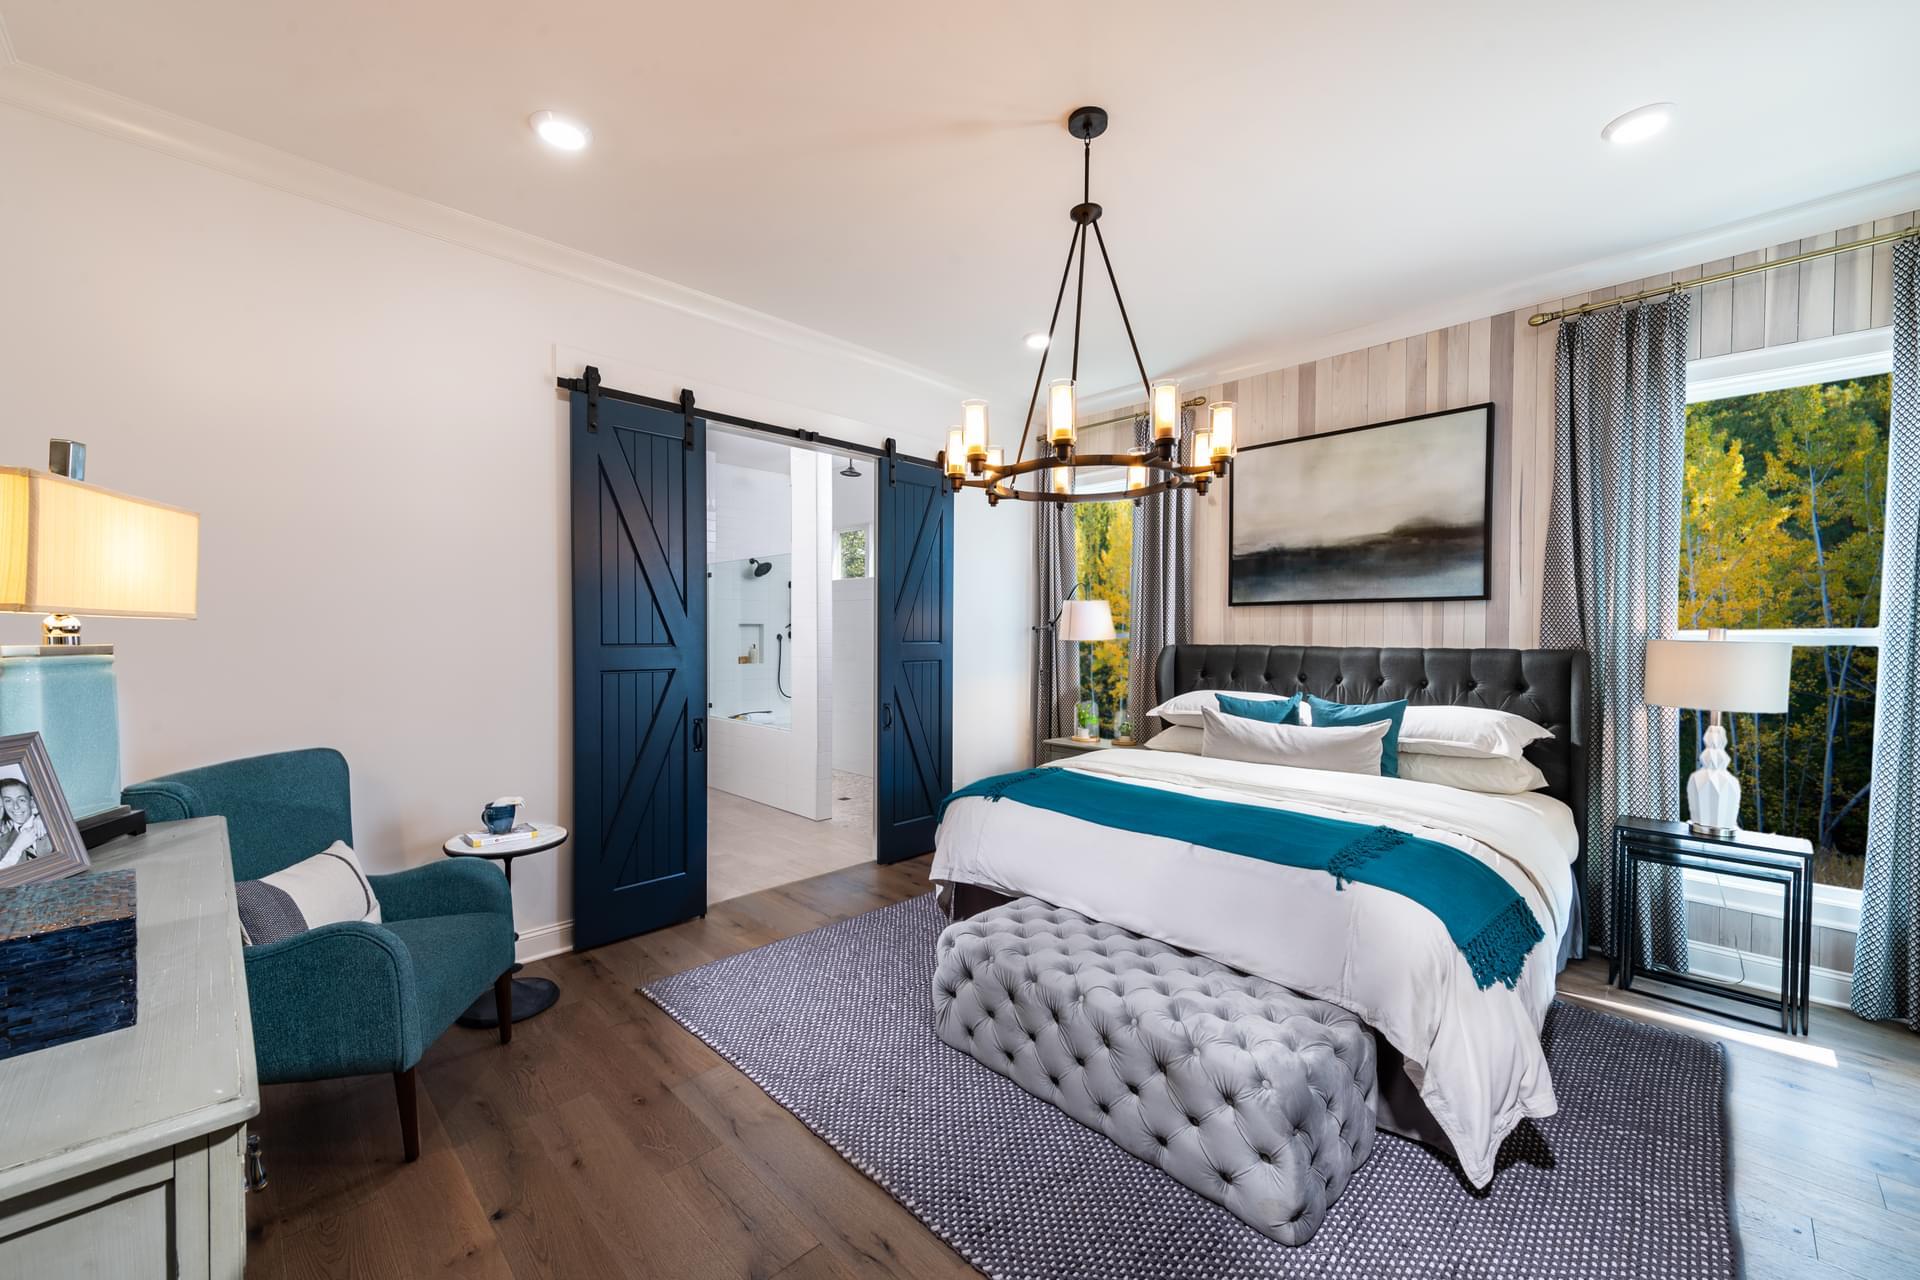 Bedrooms Photos